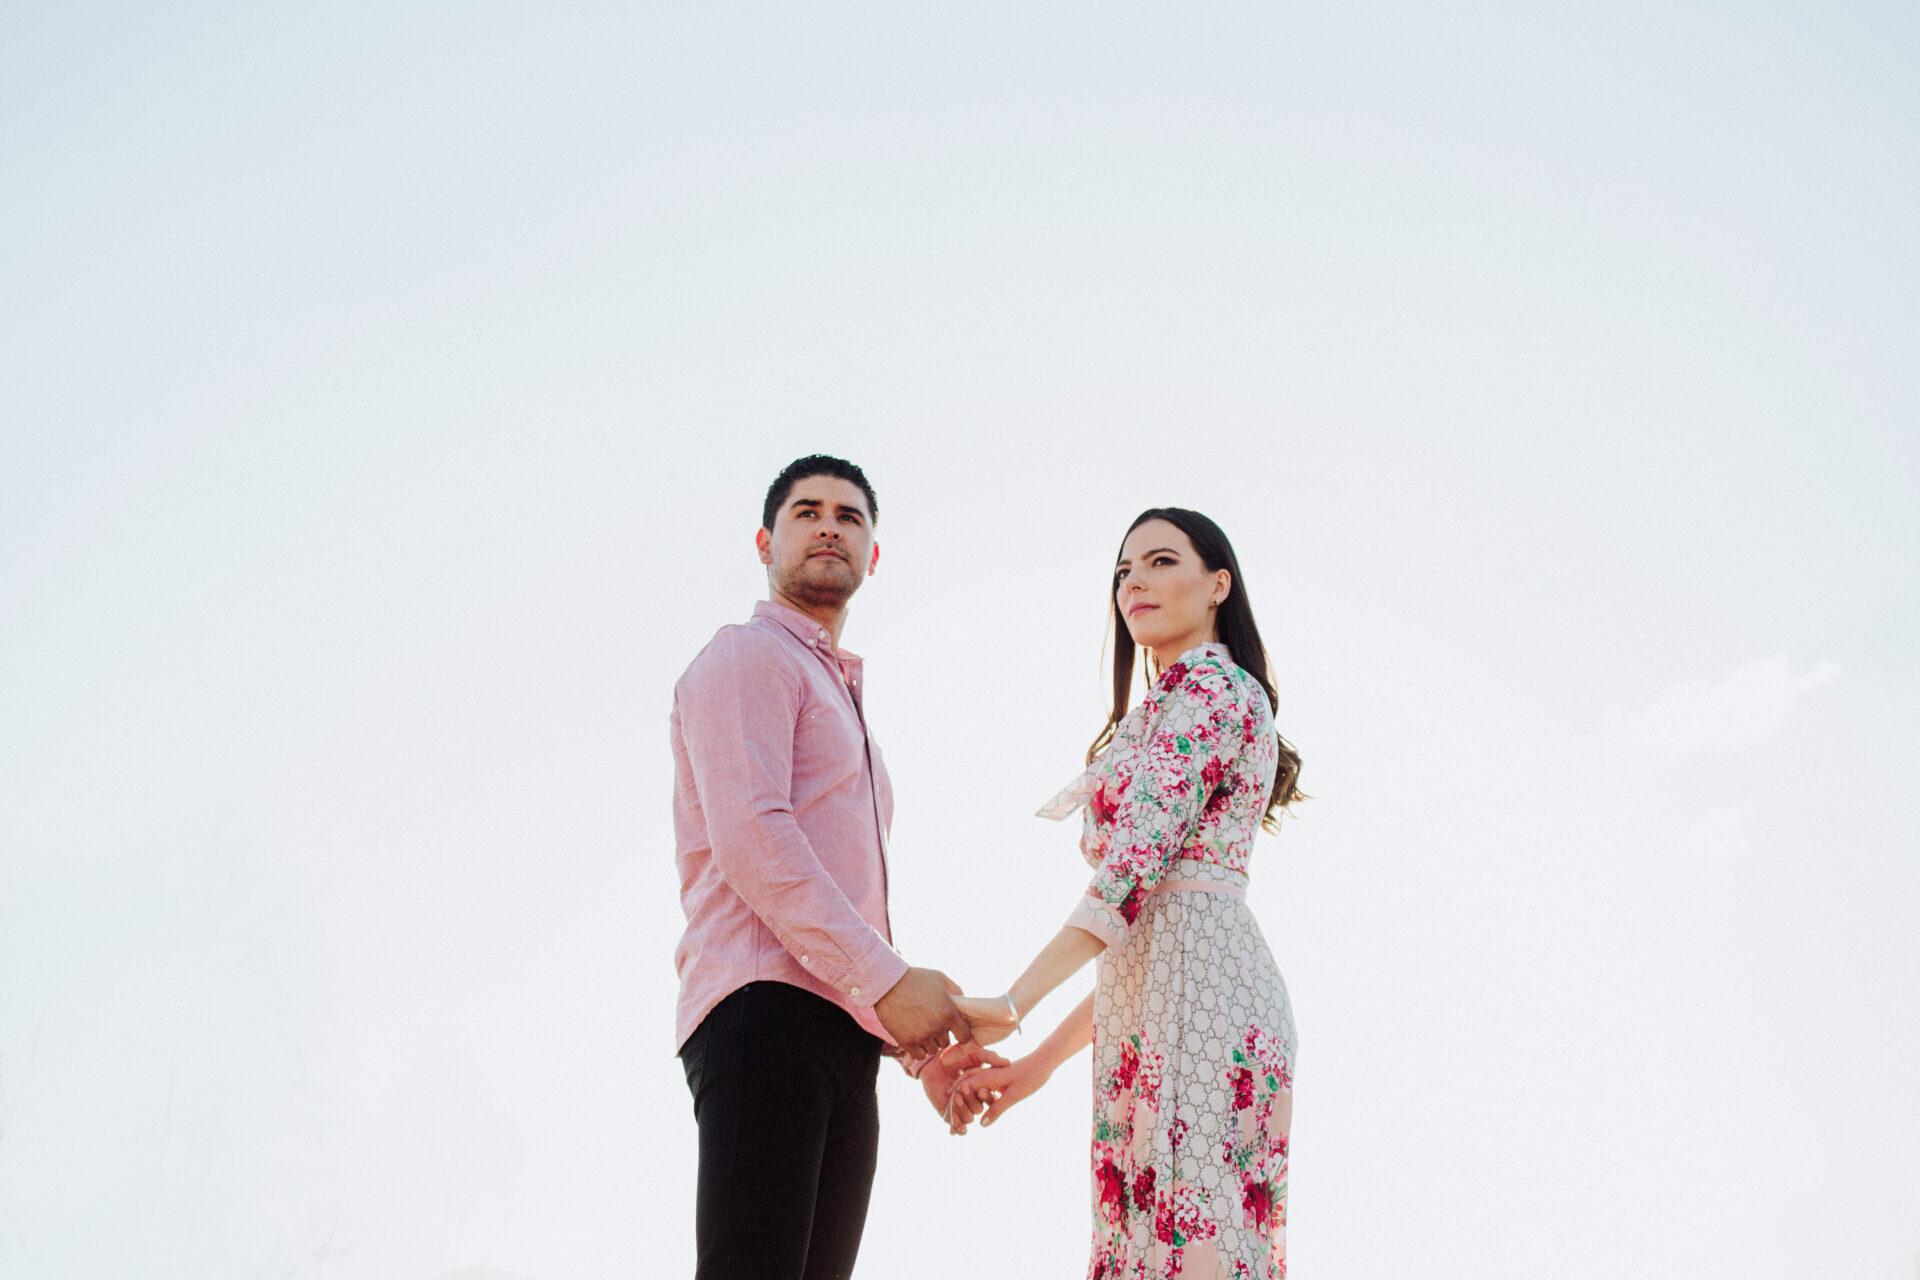 javier_noriega_fotografo_bodas_save_the_date_preboda_zacatecas_wedding_photographer5